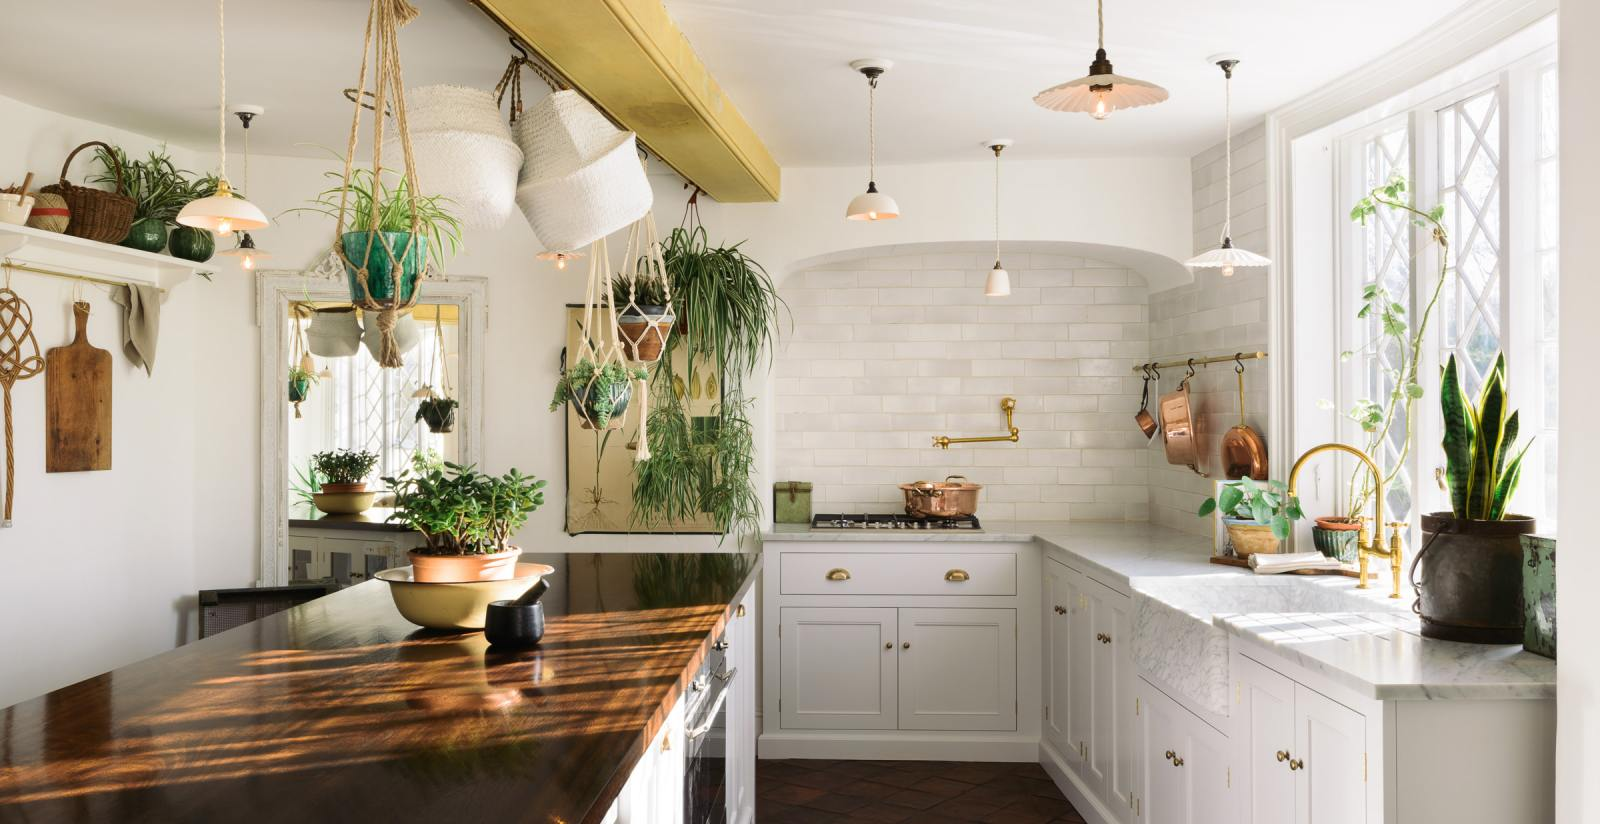 deVOL Kitchens - Simple Furniture, Beautifully Made ...